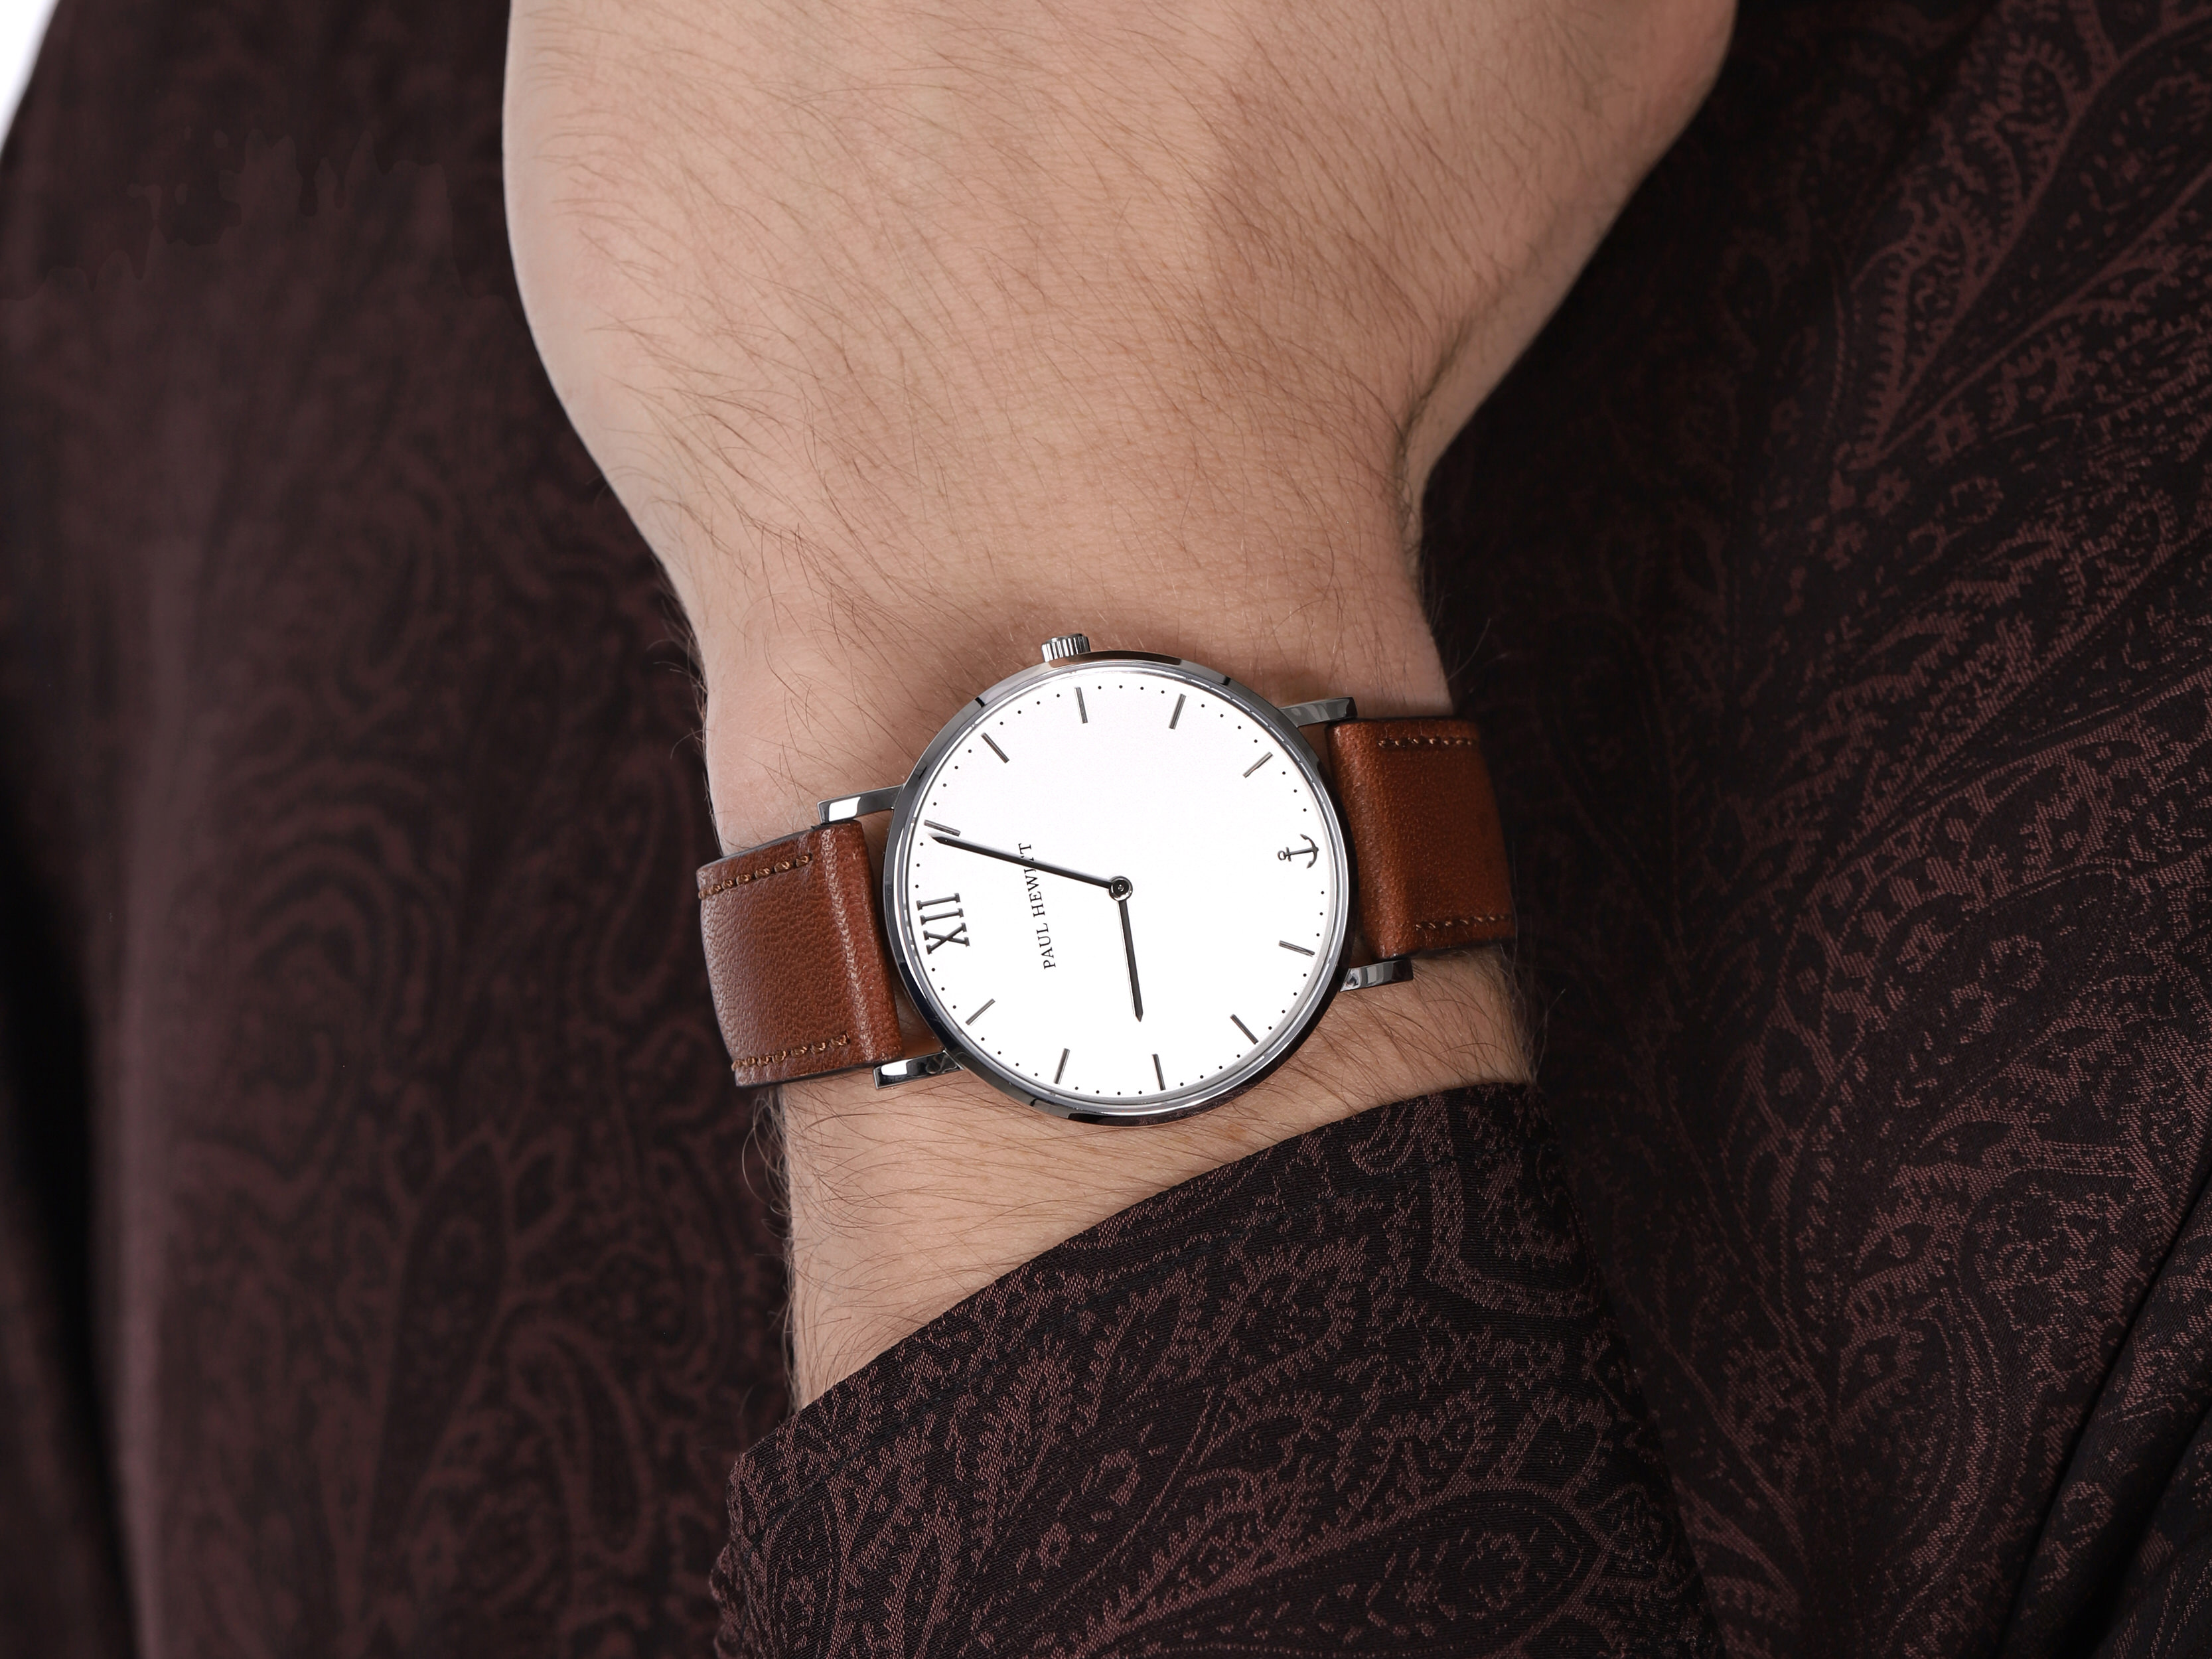 zegarek Paul Hewitt PH-SA-S-ST-W-1M kwarcowy męski Sailor Line